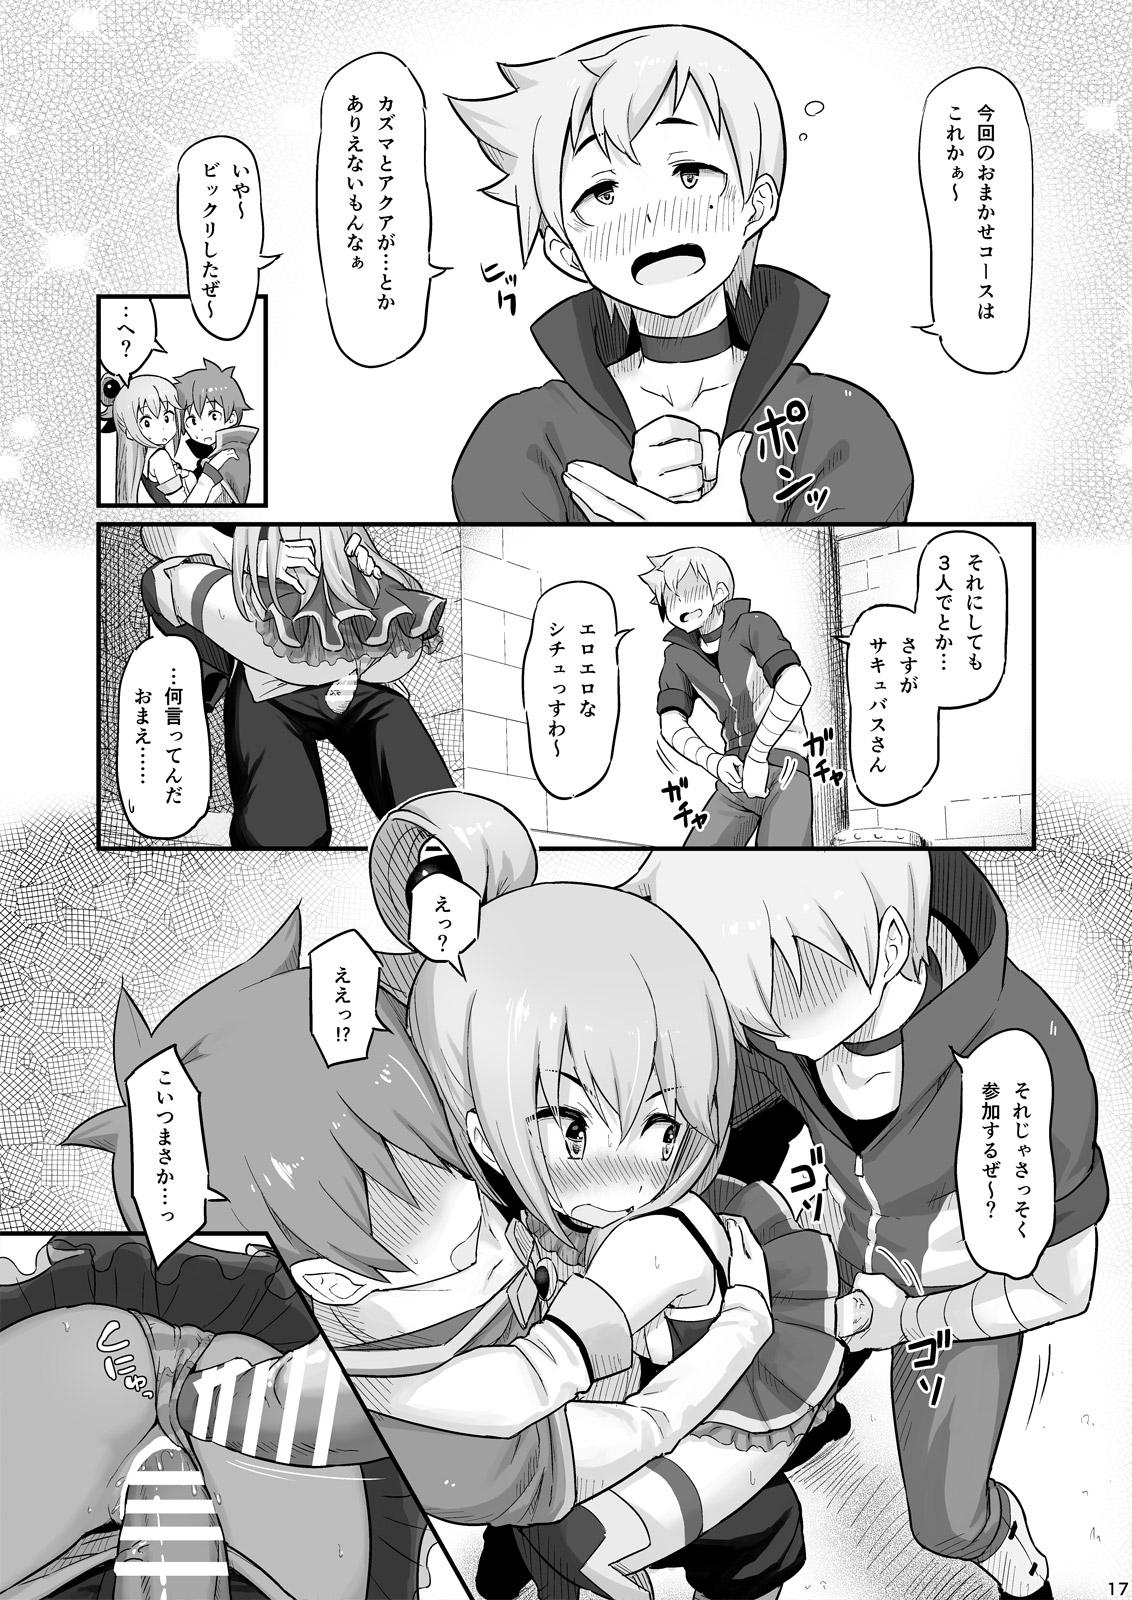 Damegami-sama wa Nomisugi ni Gochuui o! 17